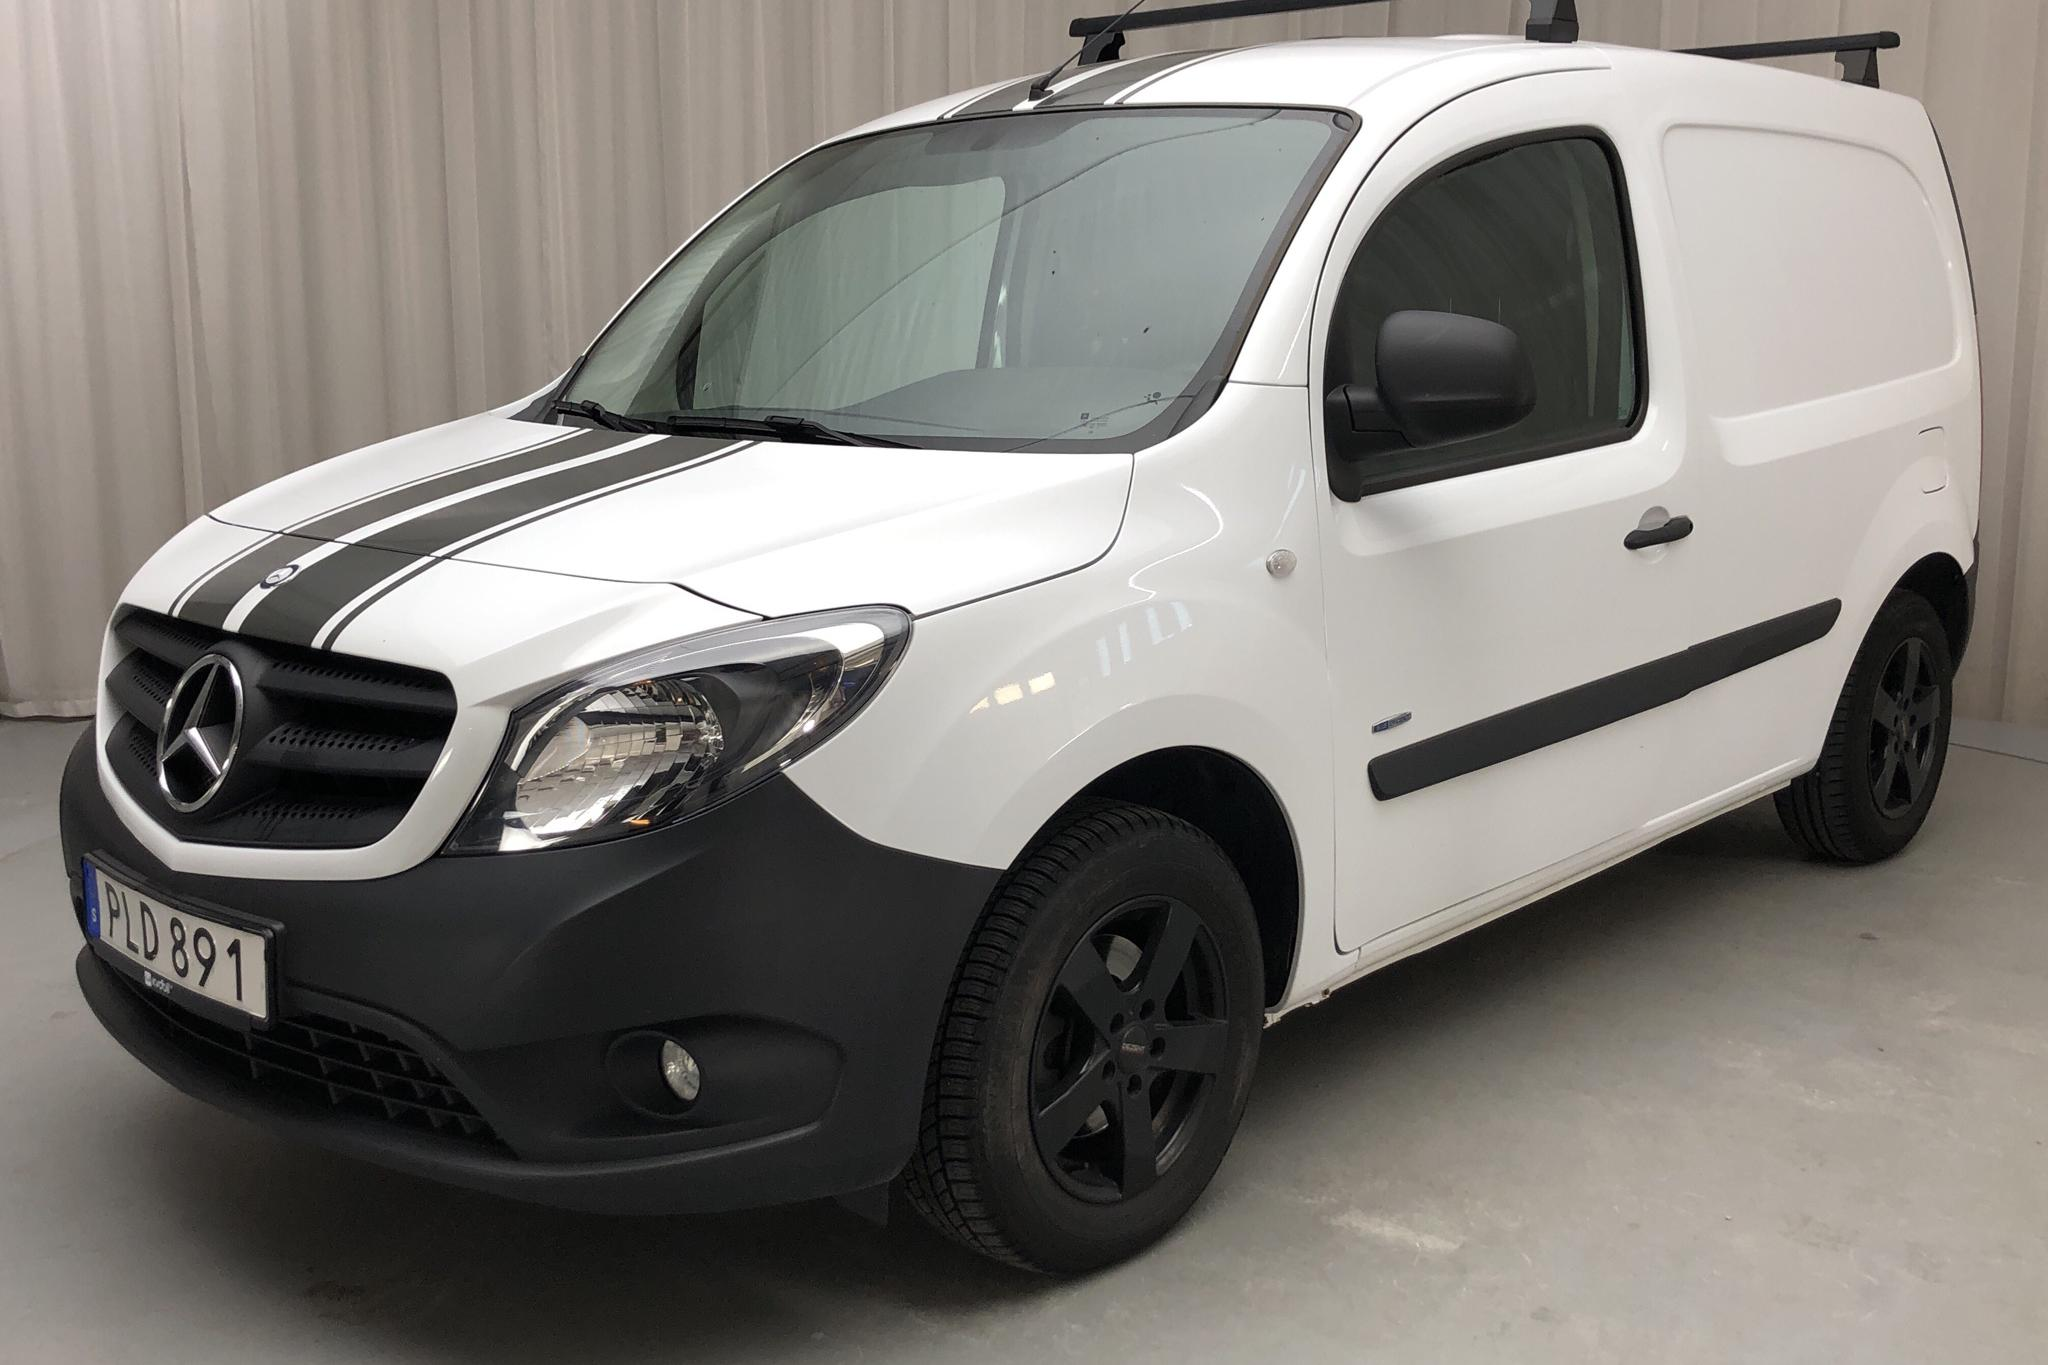 Mercedes Citan 109 1.5 CDI (90hk) - 4 589 mil - Manuell - vit - 2017